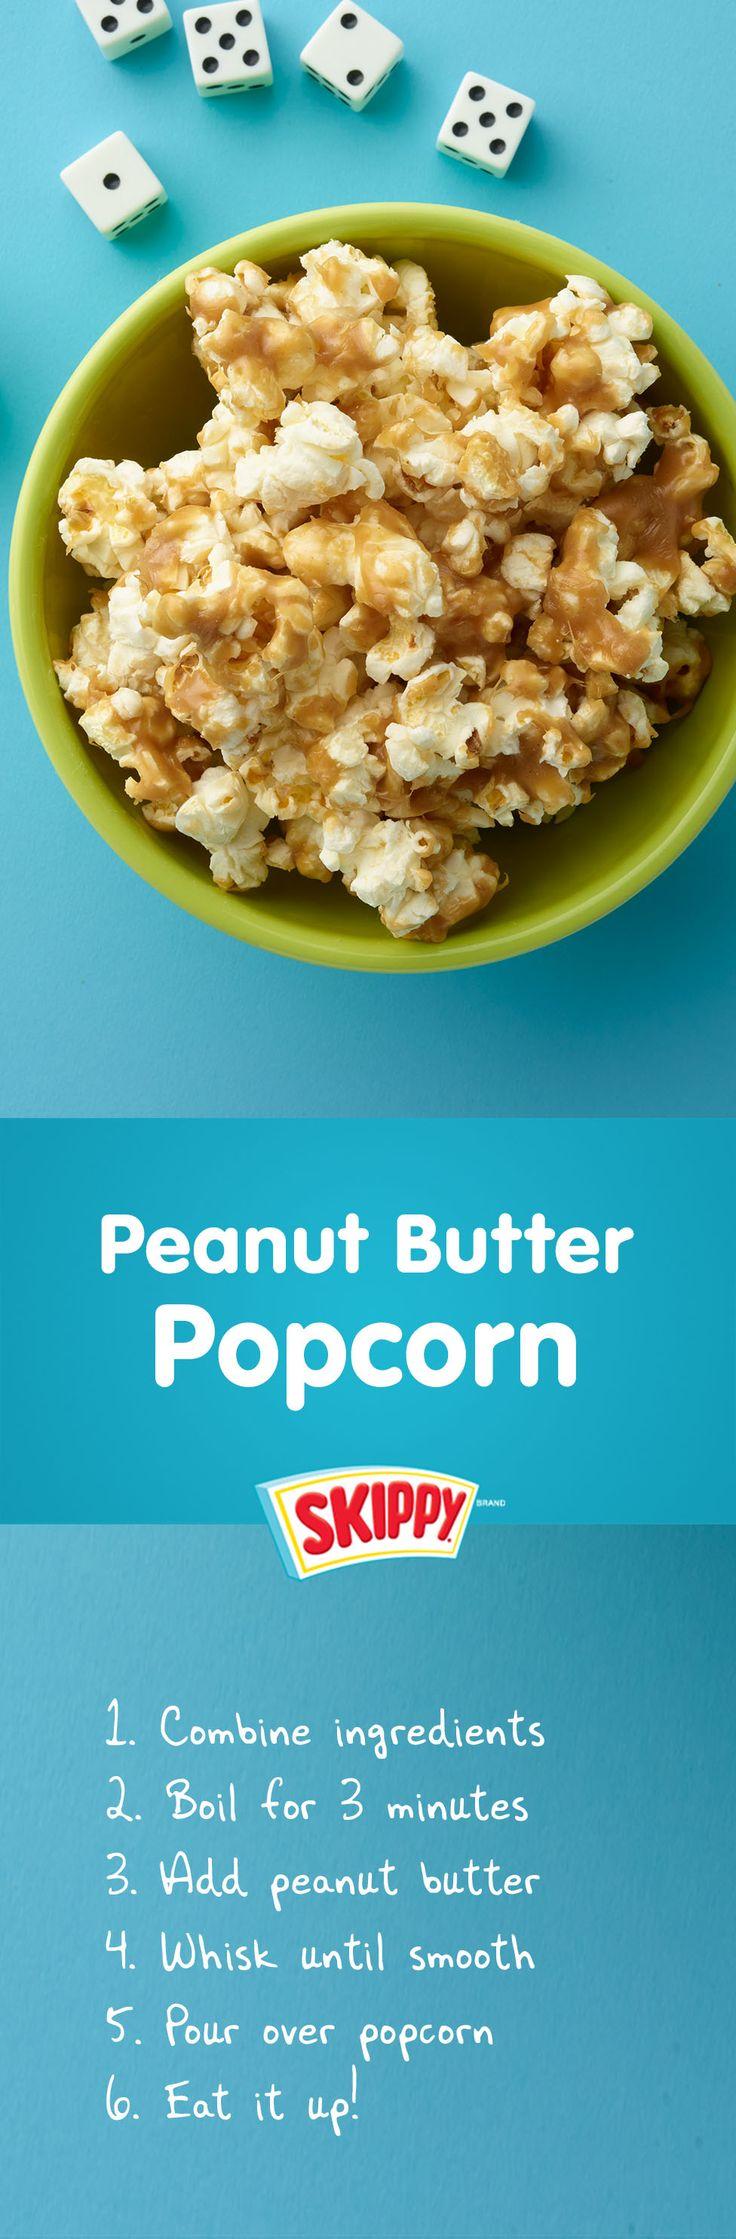 Keep The Good Snacks Popping! Popcorn   Snacks   Peanut Butter   SKIPPY® Brand   Movie Snacks  